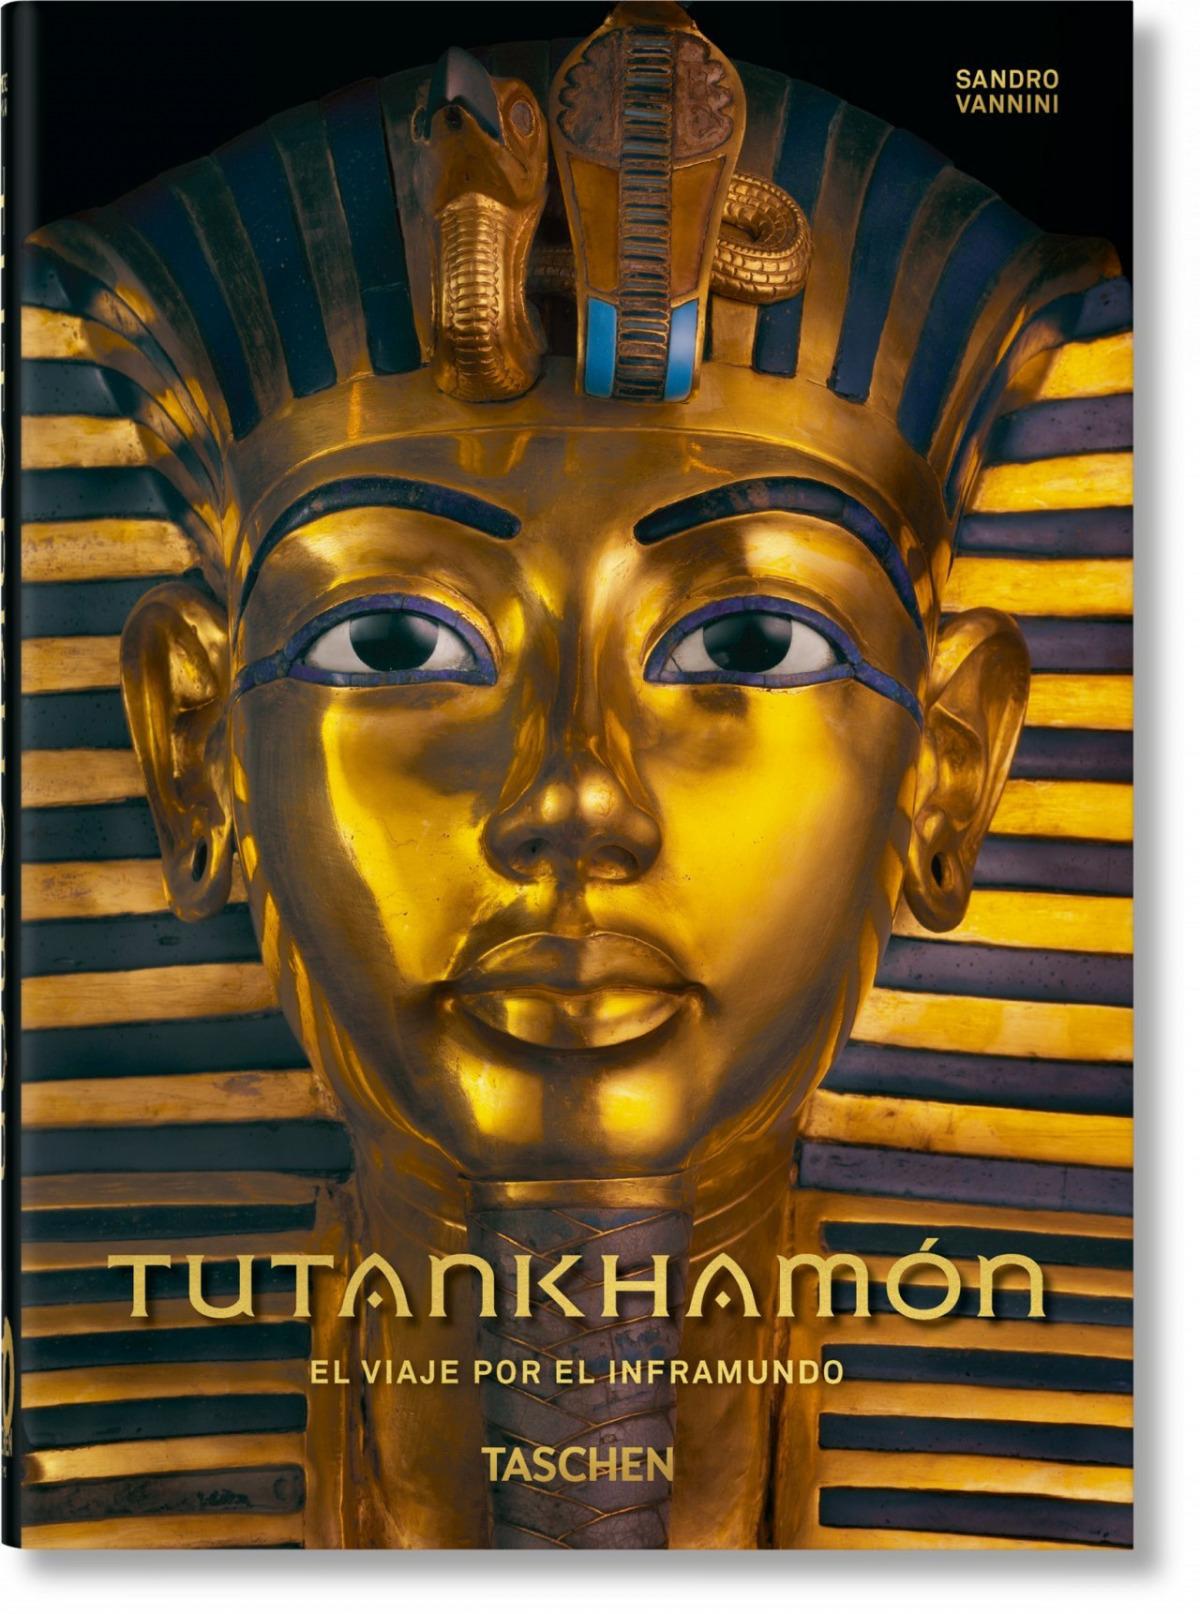 Tutankhamón. El viaje por el inframundo. 40th Anniversary Edition